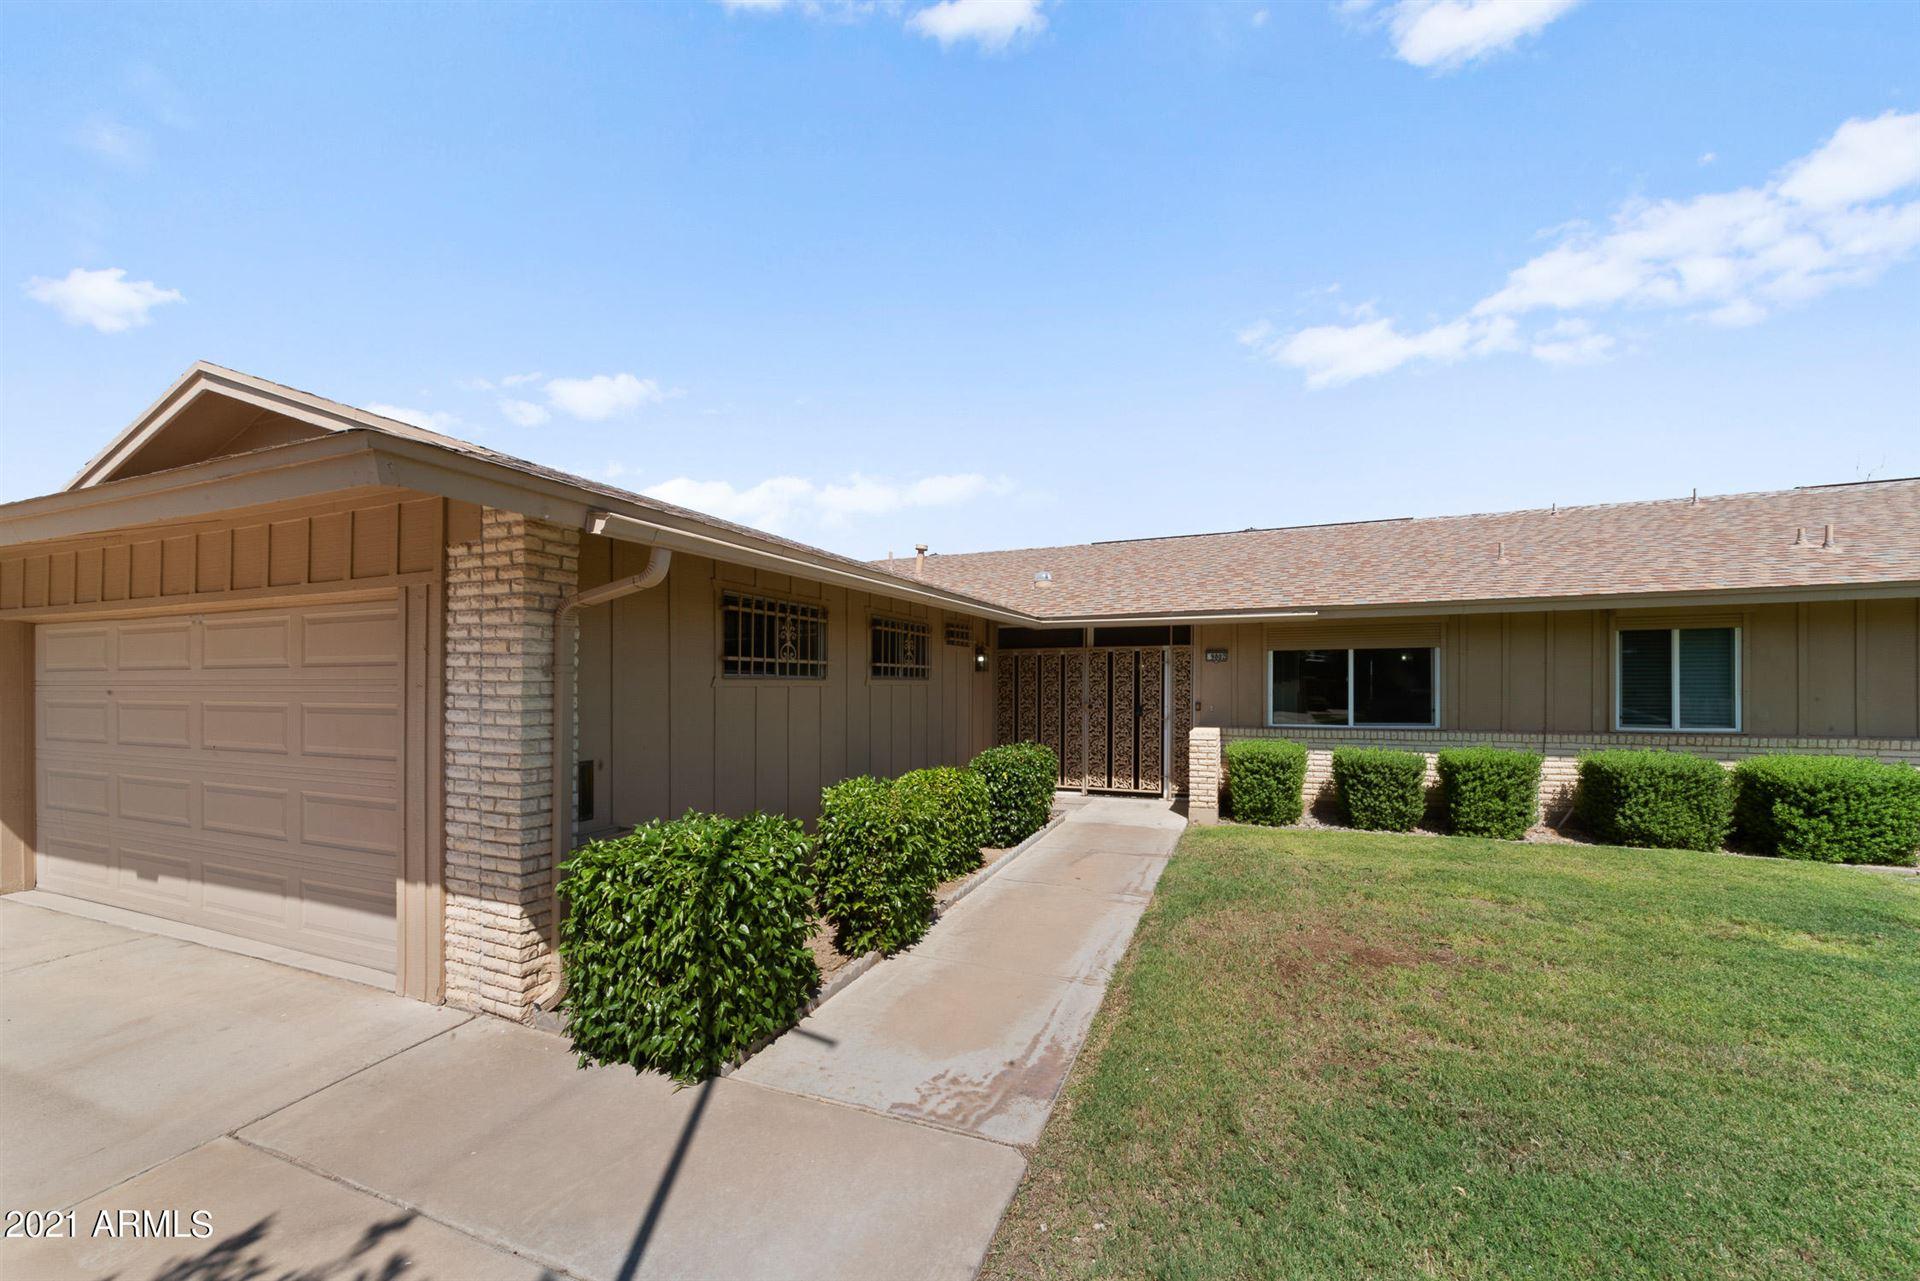 9802 N BALBOA Drive, Sun City, AZ 85351 - MLS#: 6262558